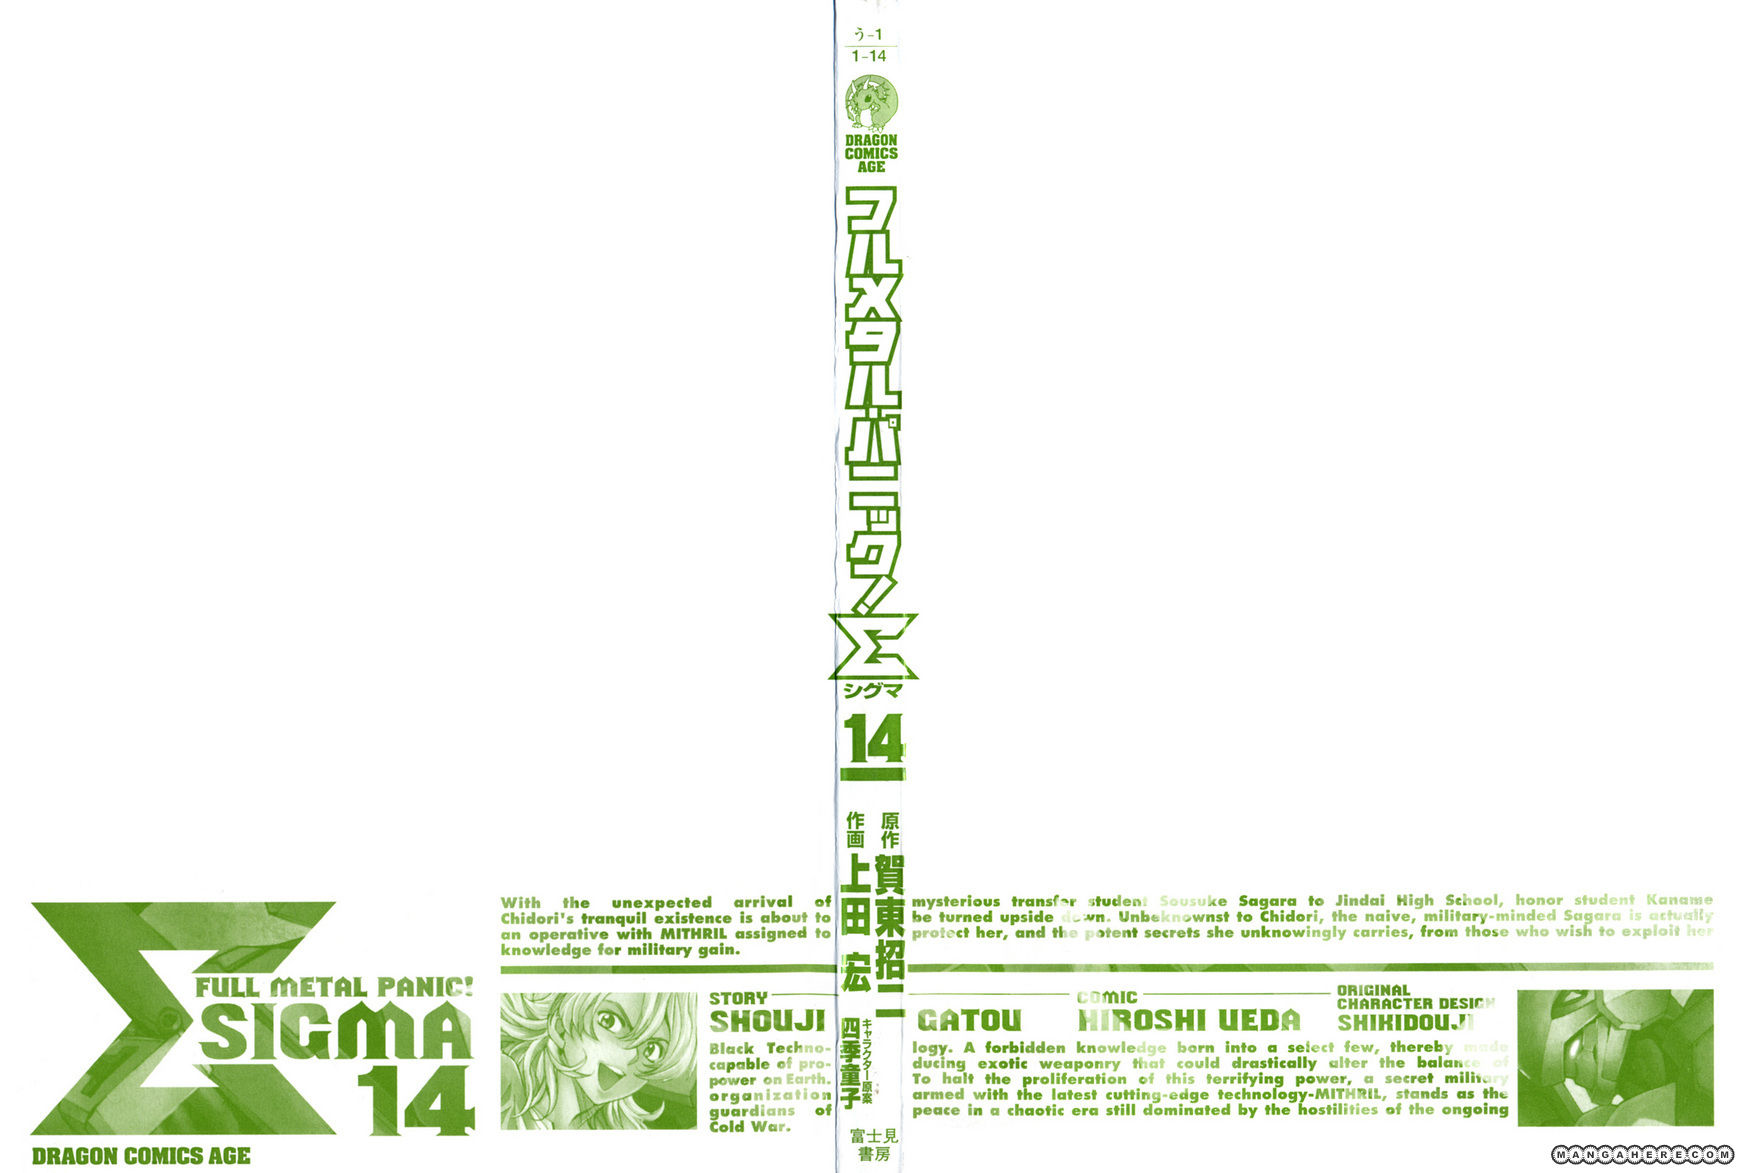 Full Metal Panic! Sigma 57 Page 2